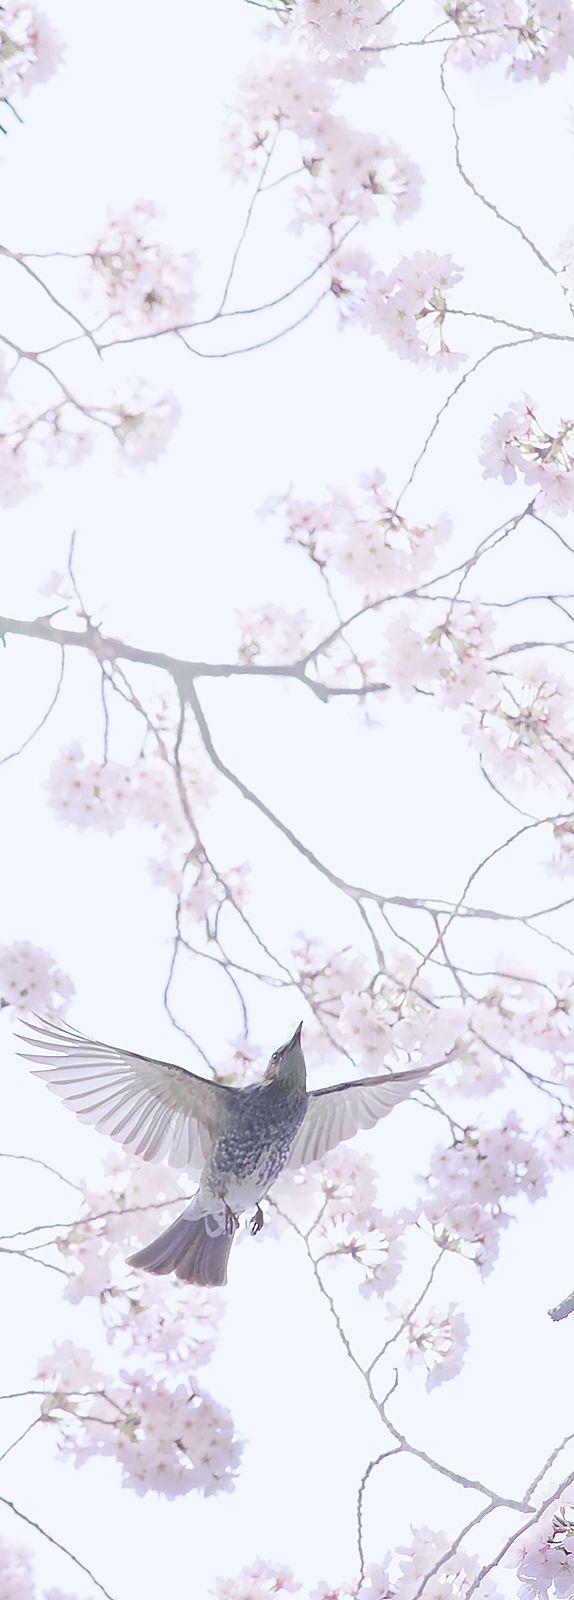 "look bird ""seasonal secrets"" (photography by Yukihiro Yoshida)"